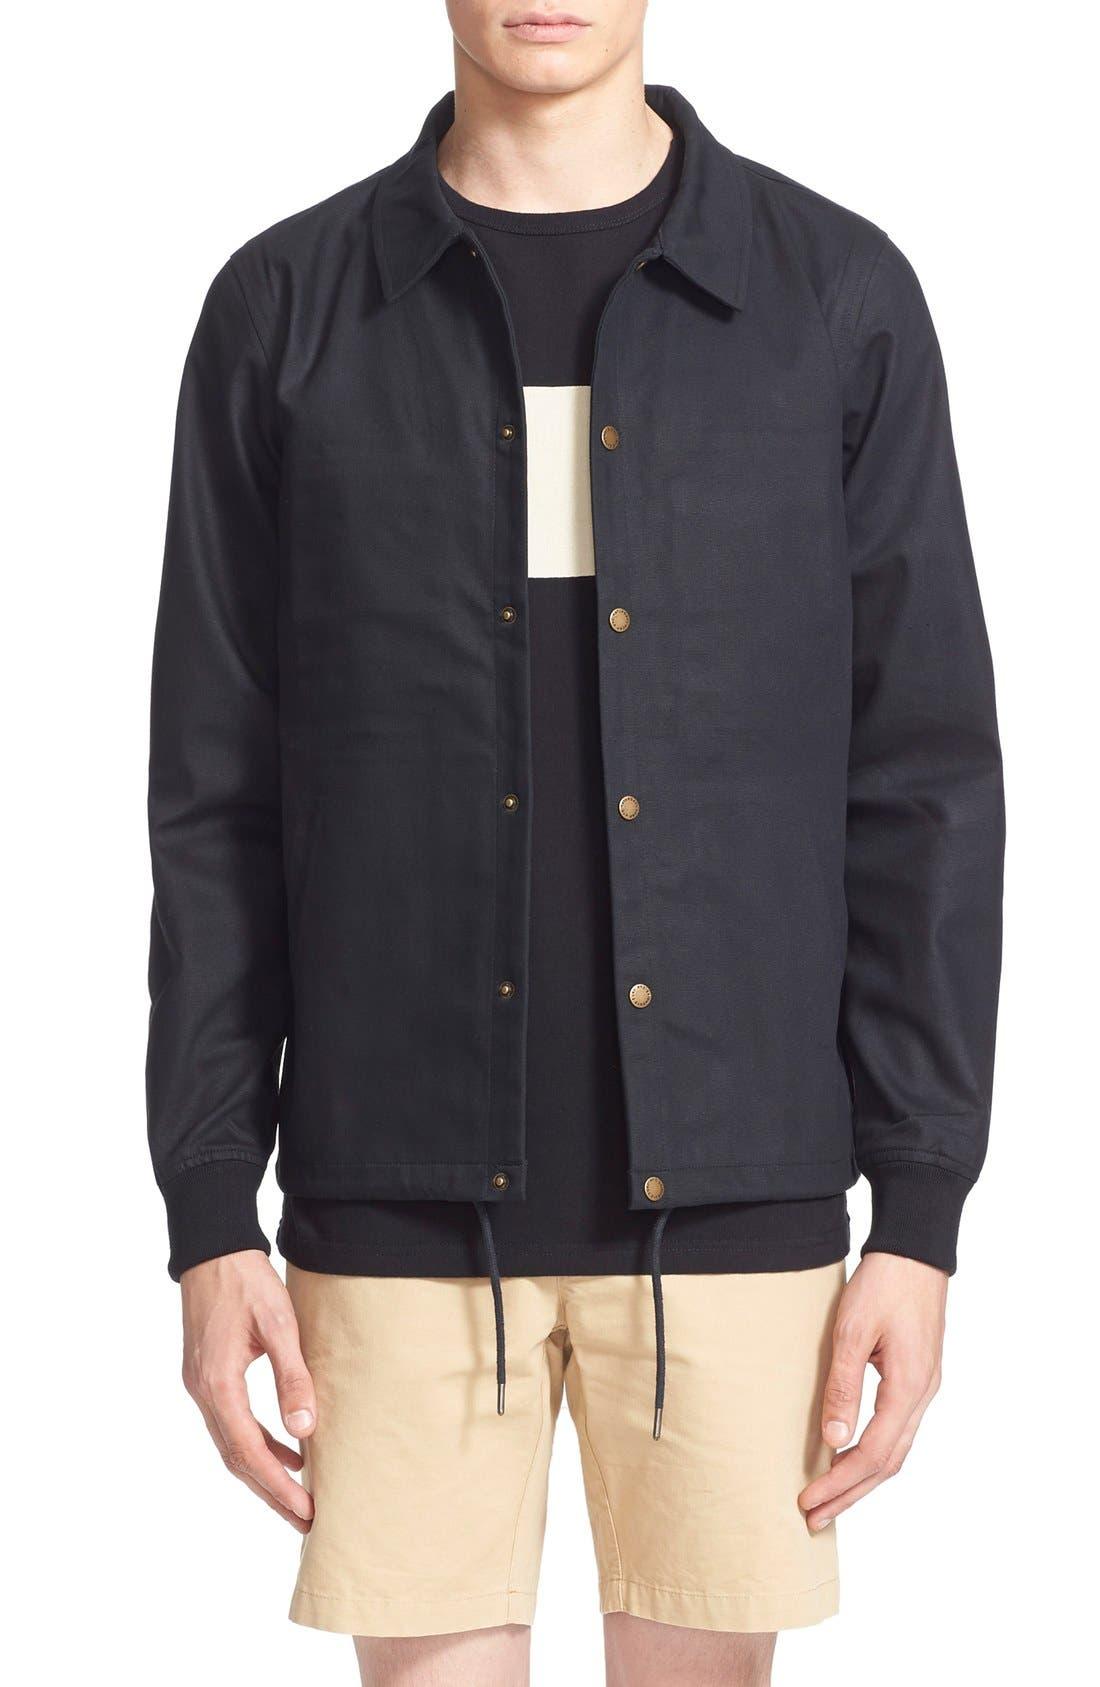 'Cooper' Bonded Cotton Poplin Jacket, Main, color, 001